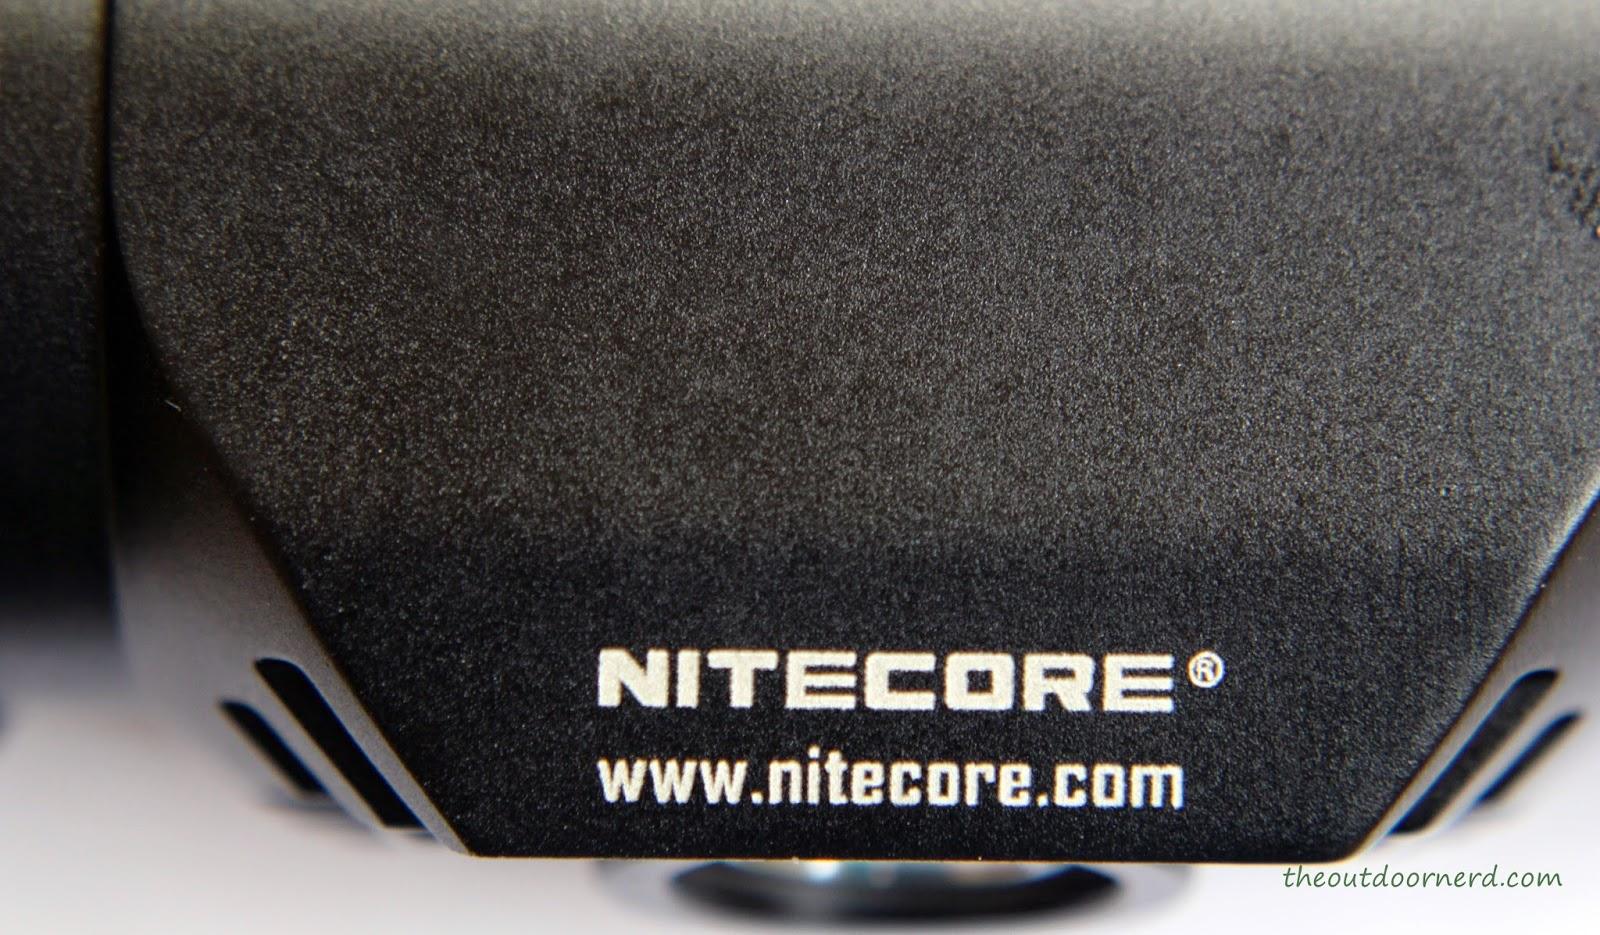 Nitecore HC50 Headlamp Logo Closeup 2